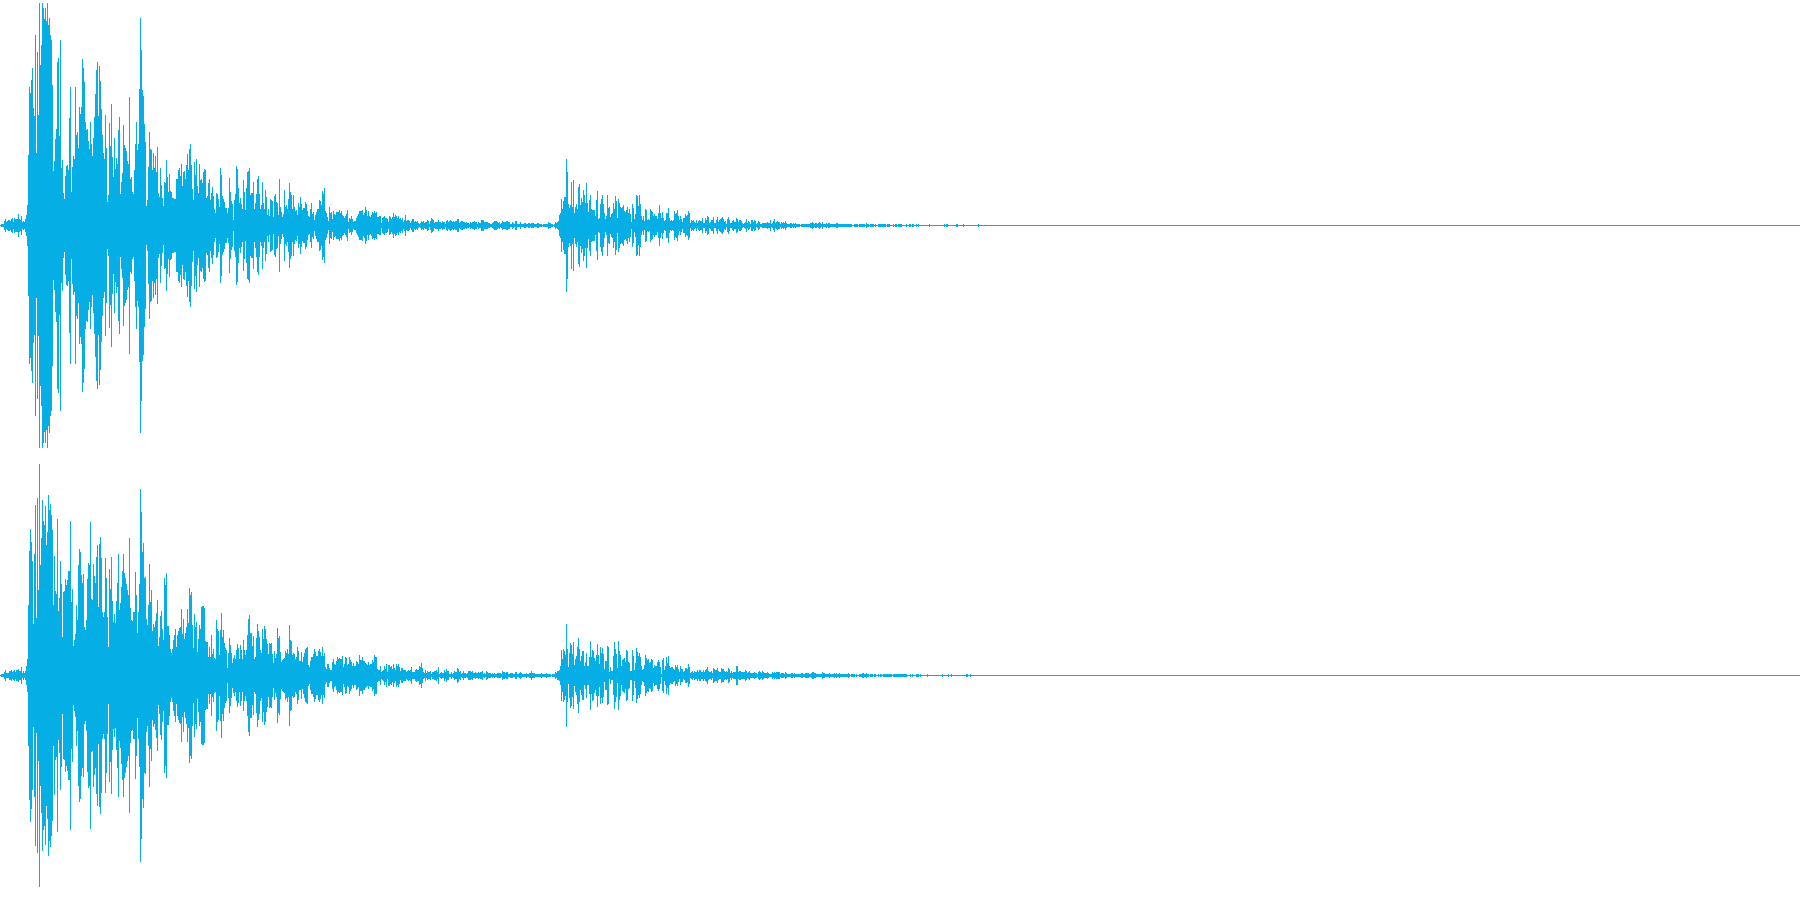 Tap カコっとボタンをタップする音の再生済みの波形